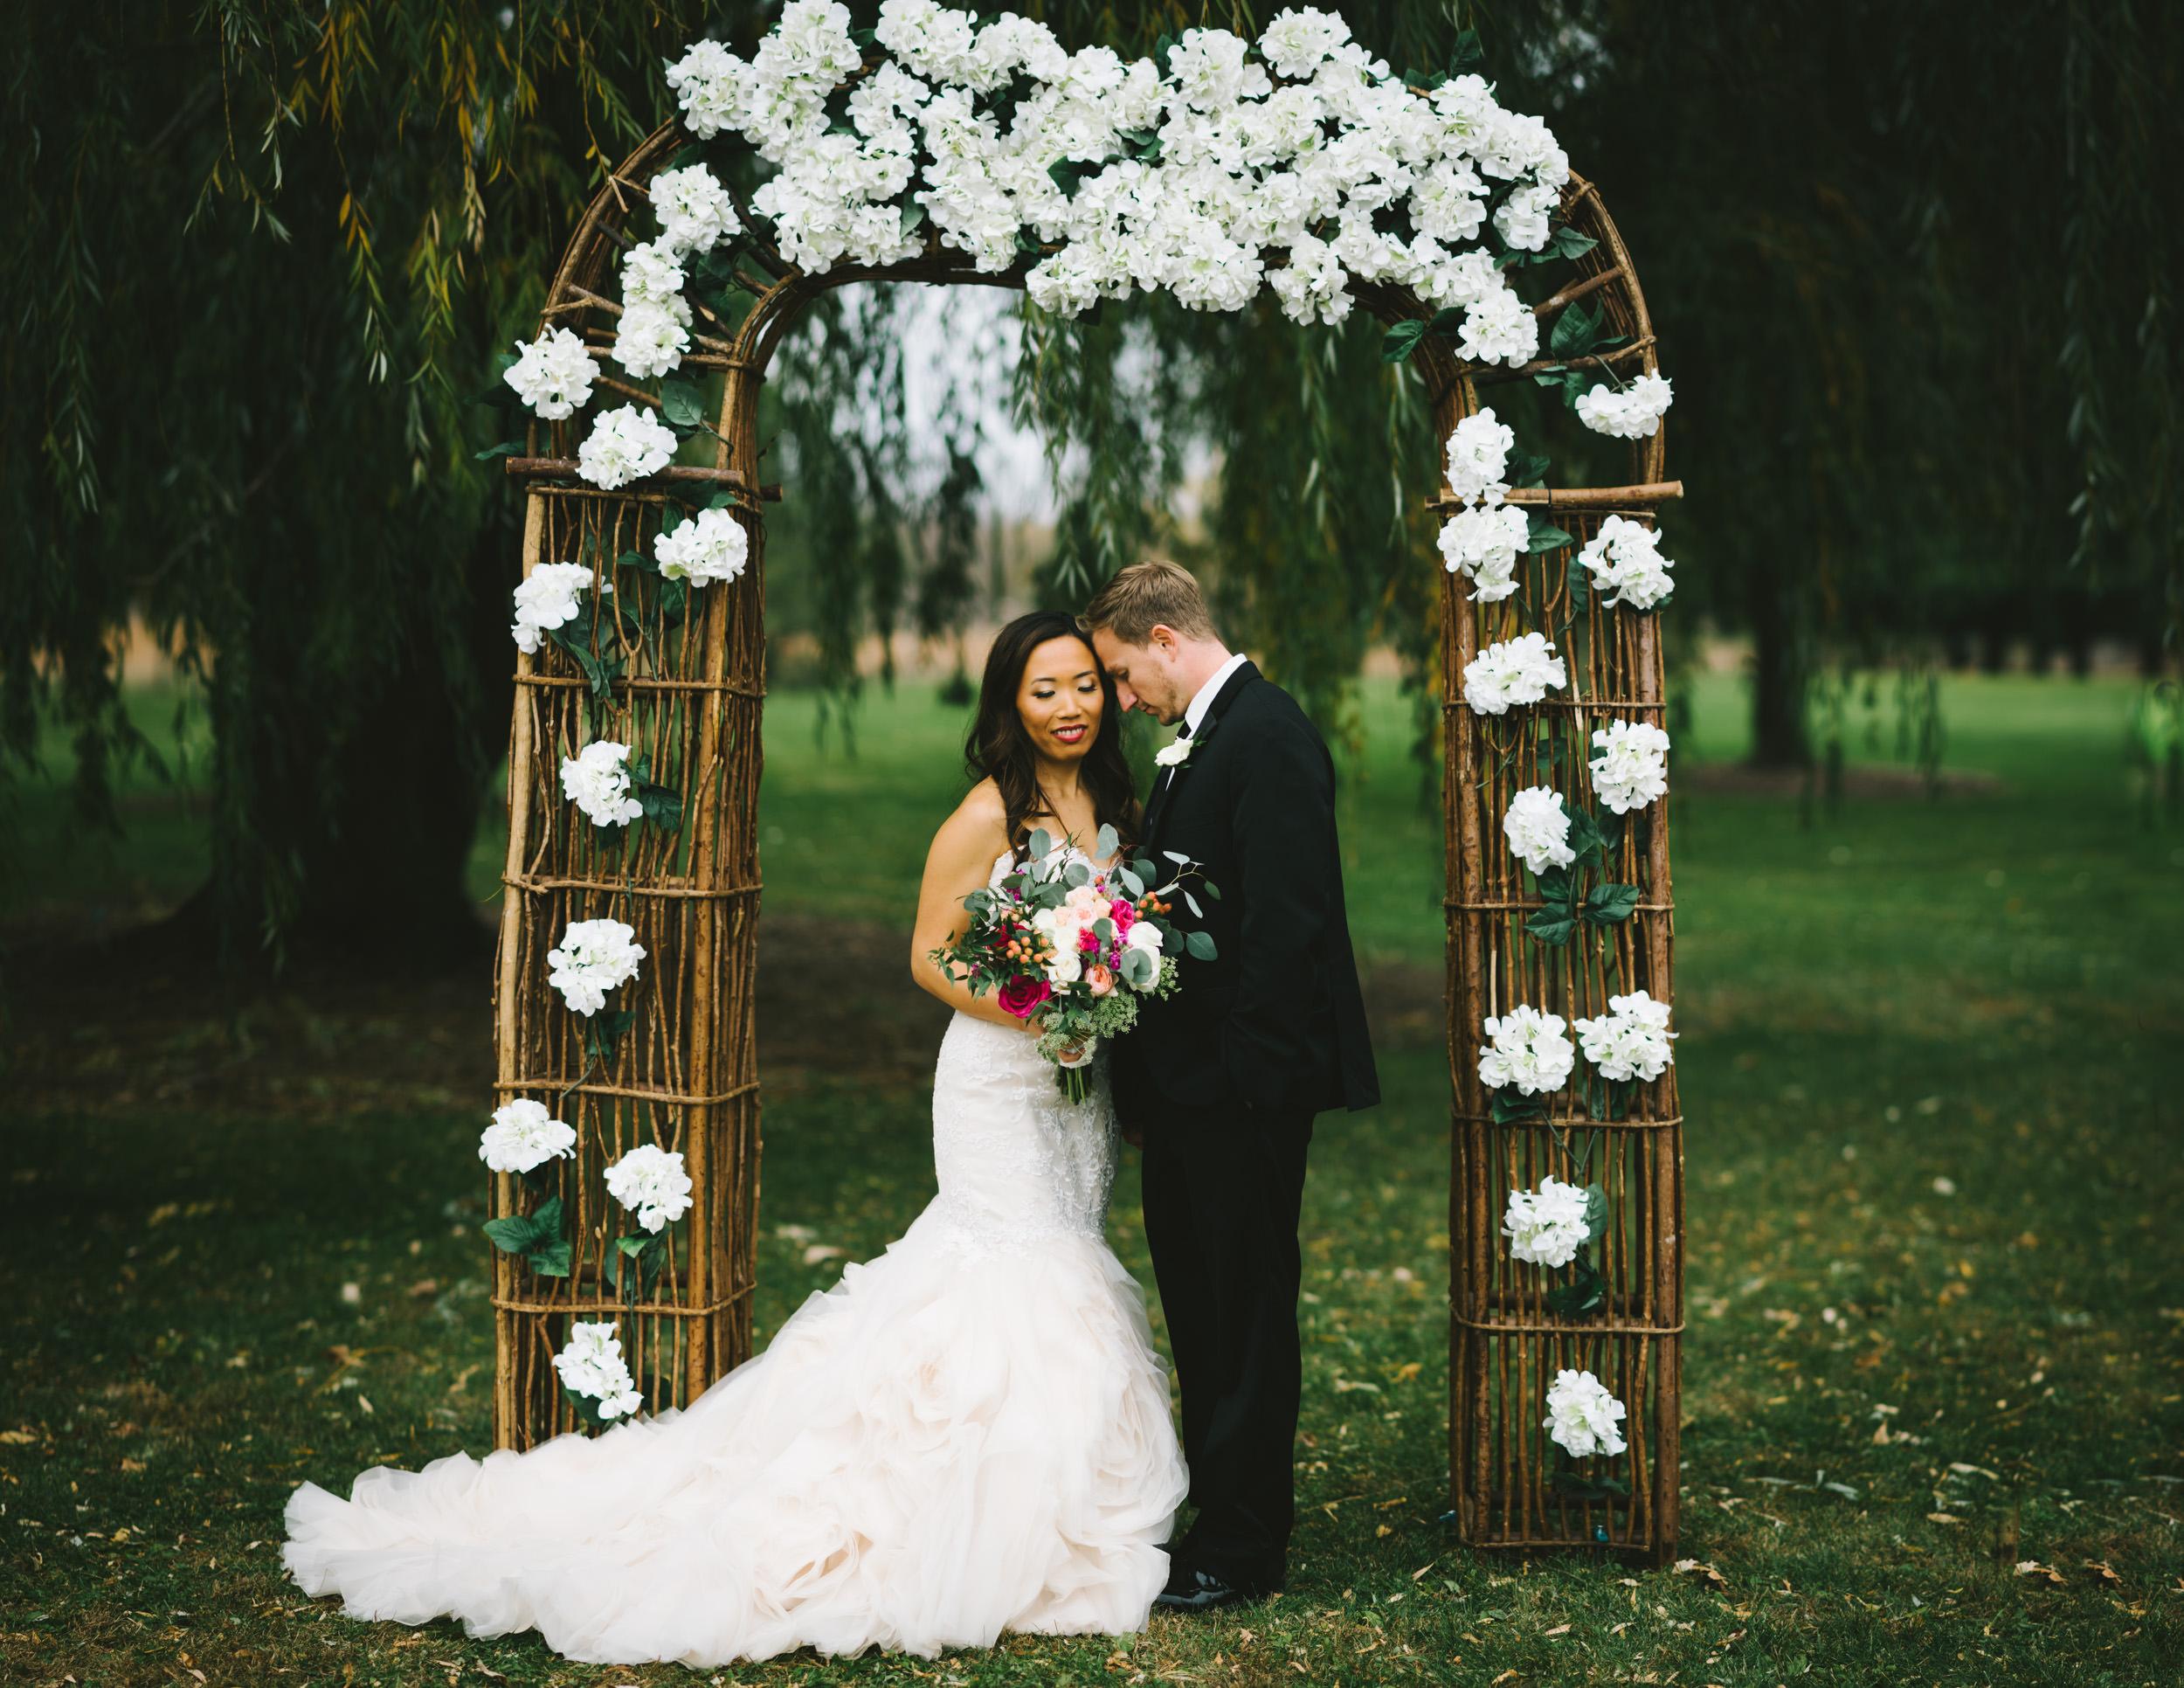 20171029_Wedding-Kristin-Garrett-459.jpg